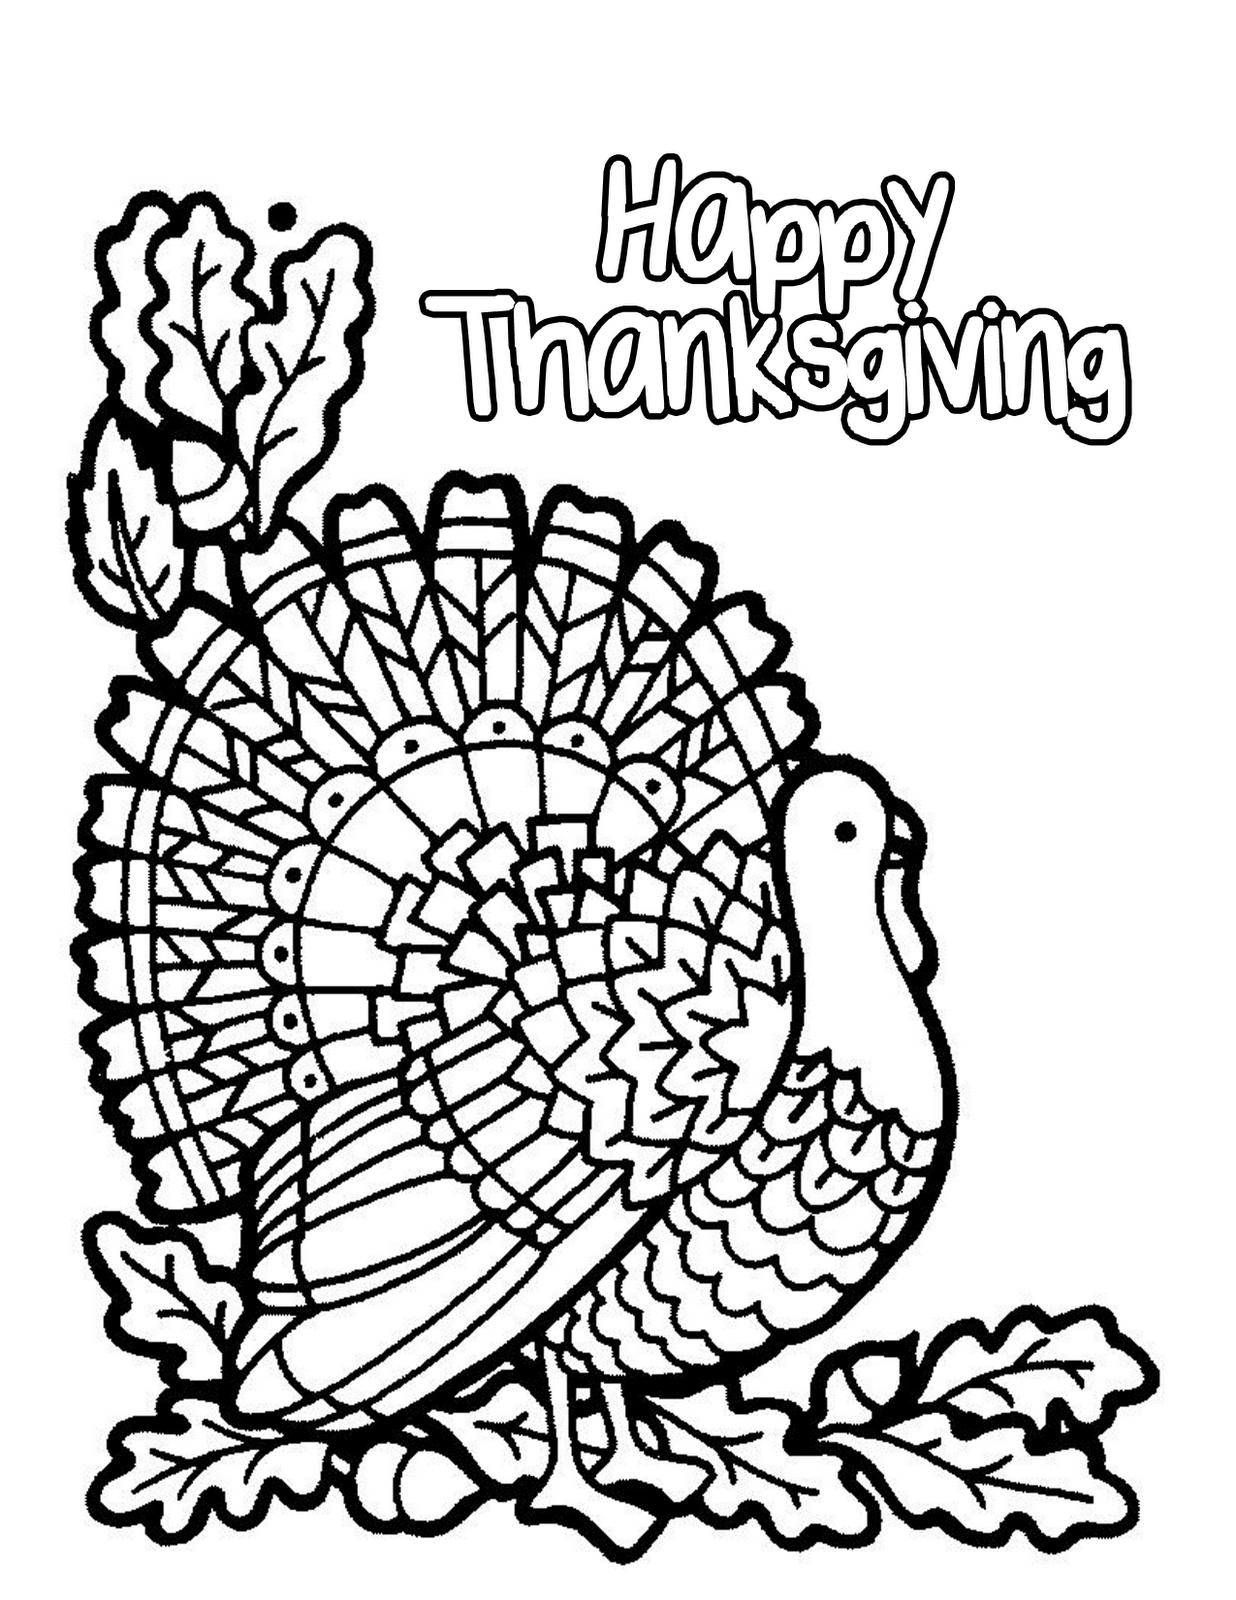 1236x1600 Thanksgiving Mandala Coloring Pages Lovely Free Printable Mandalas